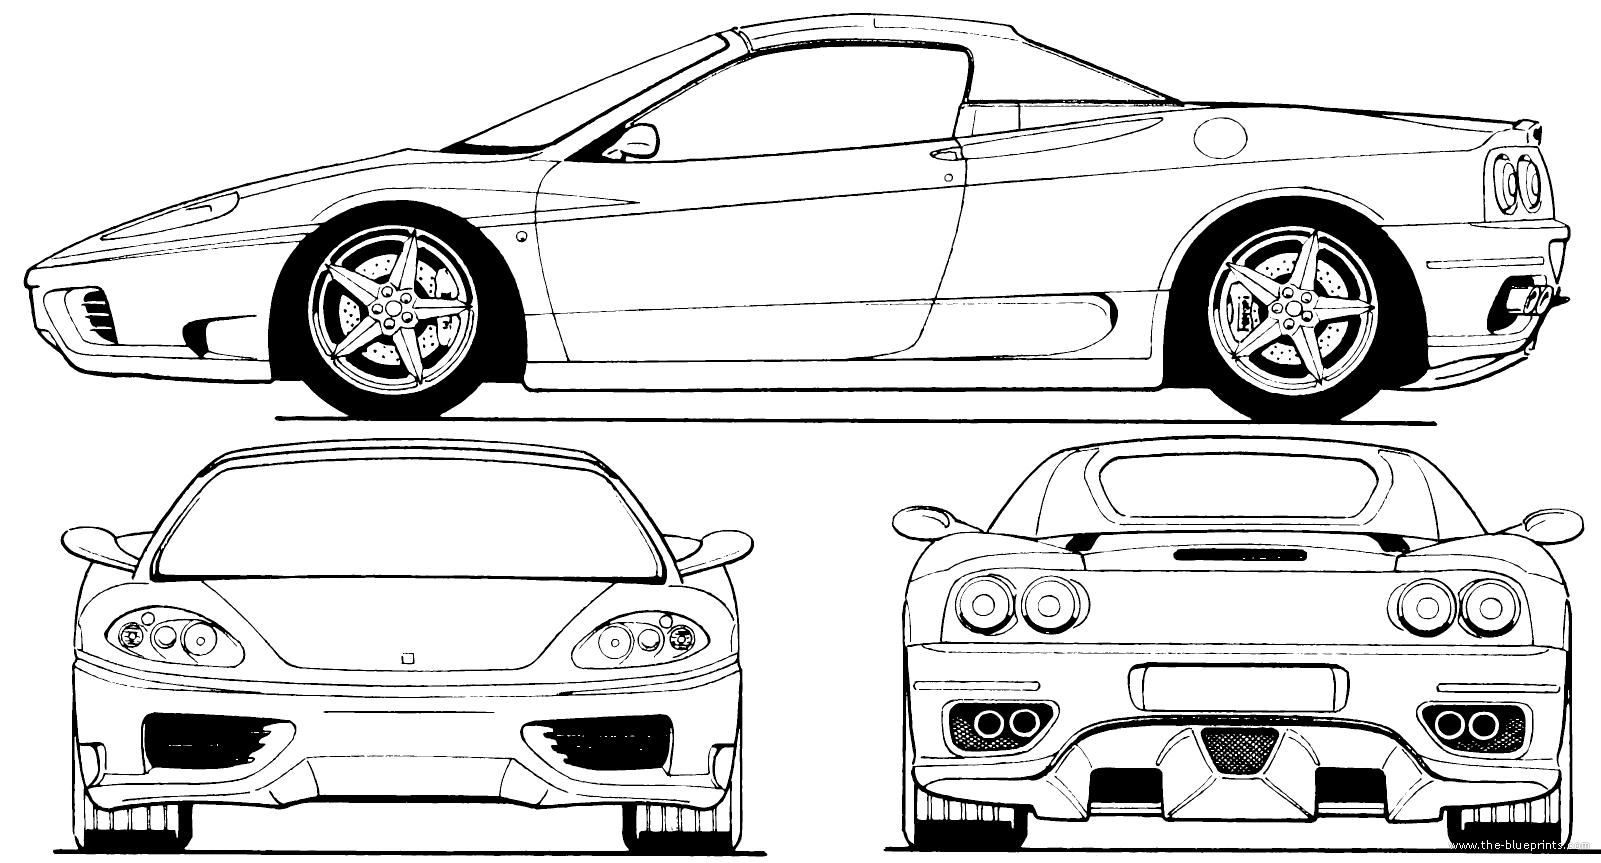 Blueprints > Cars > Ferrari > Ferrari 360 Spider (2000)